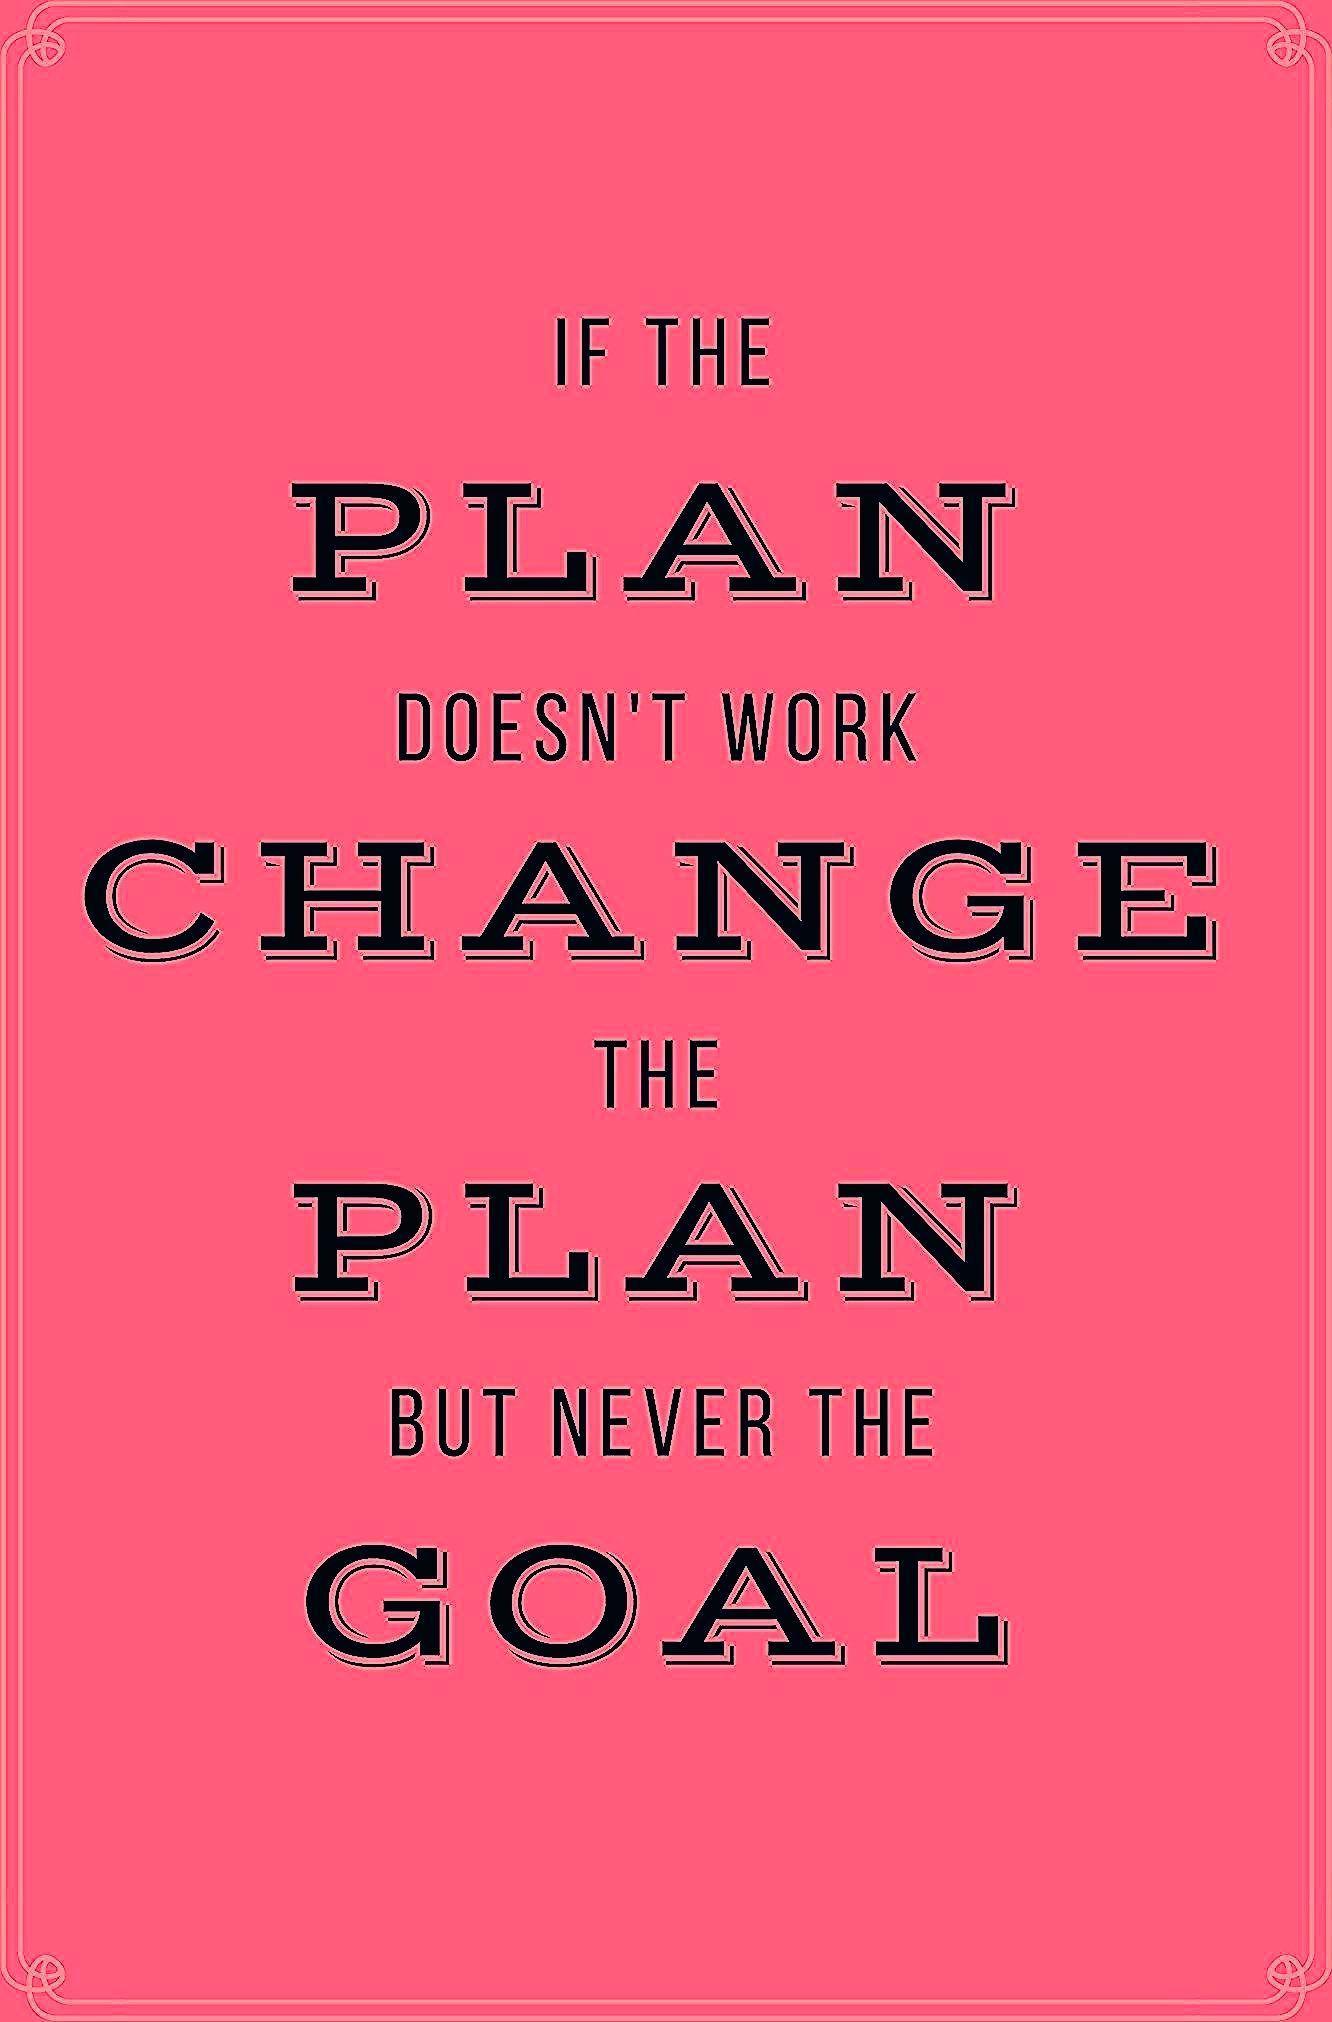 motivation fitness | motivation life | motivation quotes | motivation sports | m... -  motivation fi...